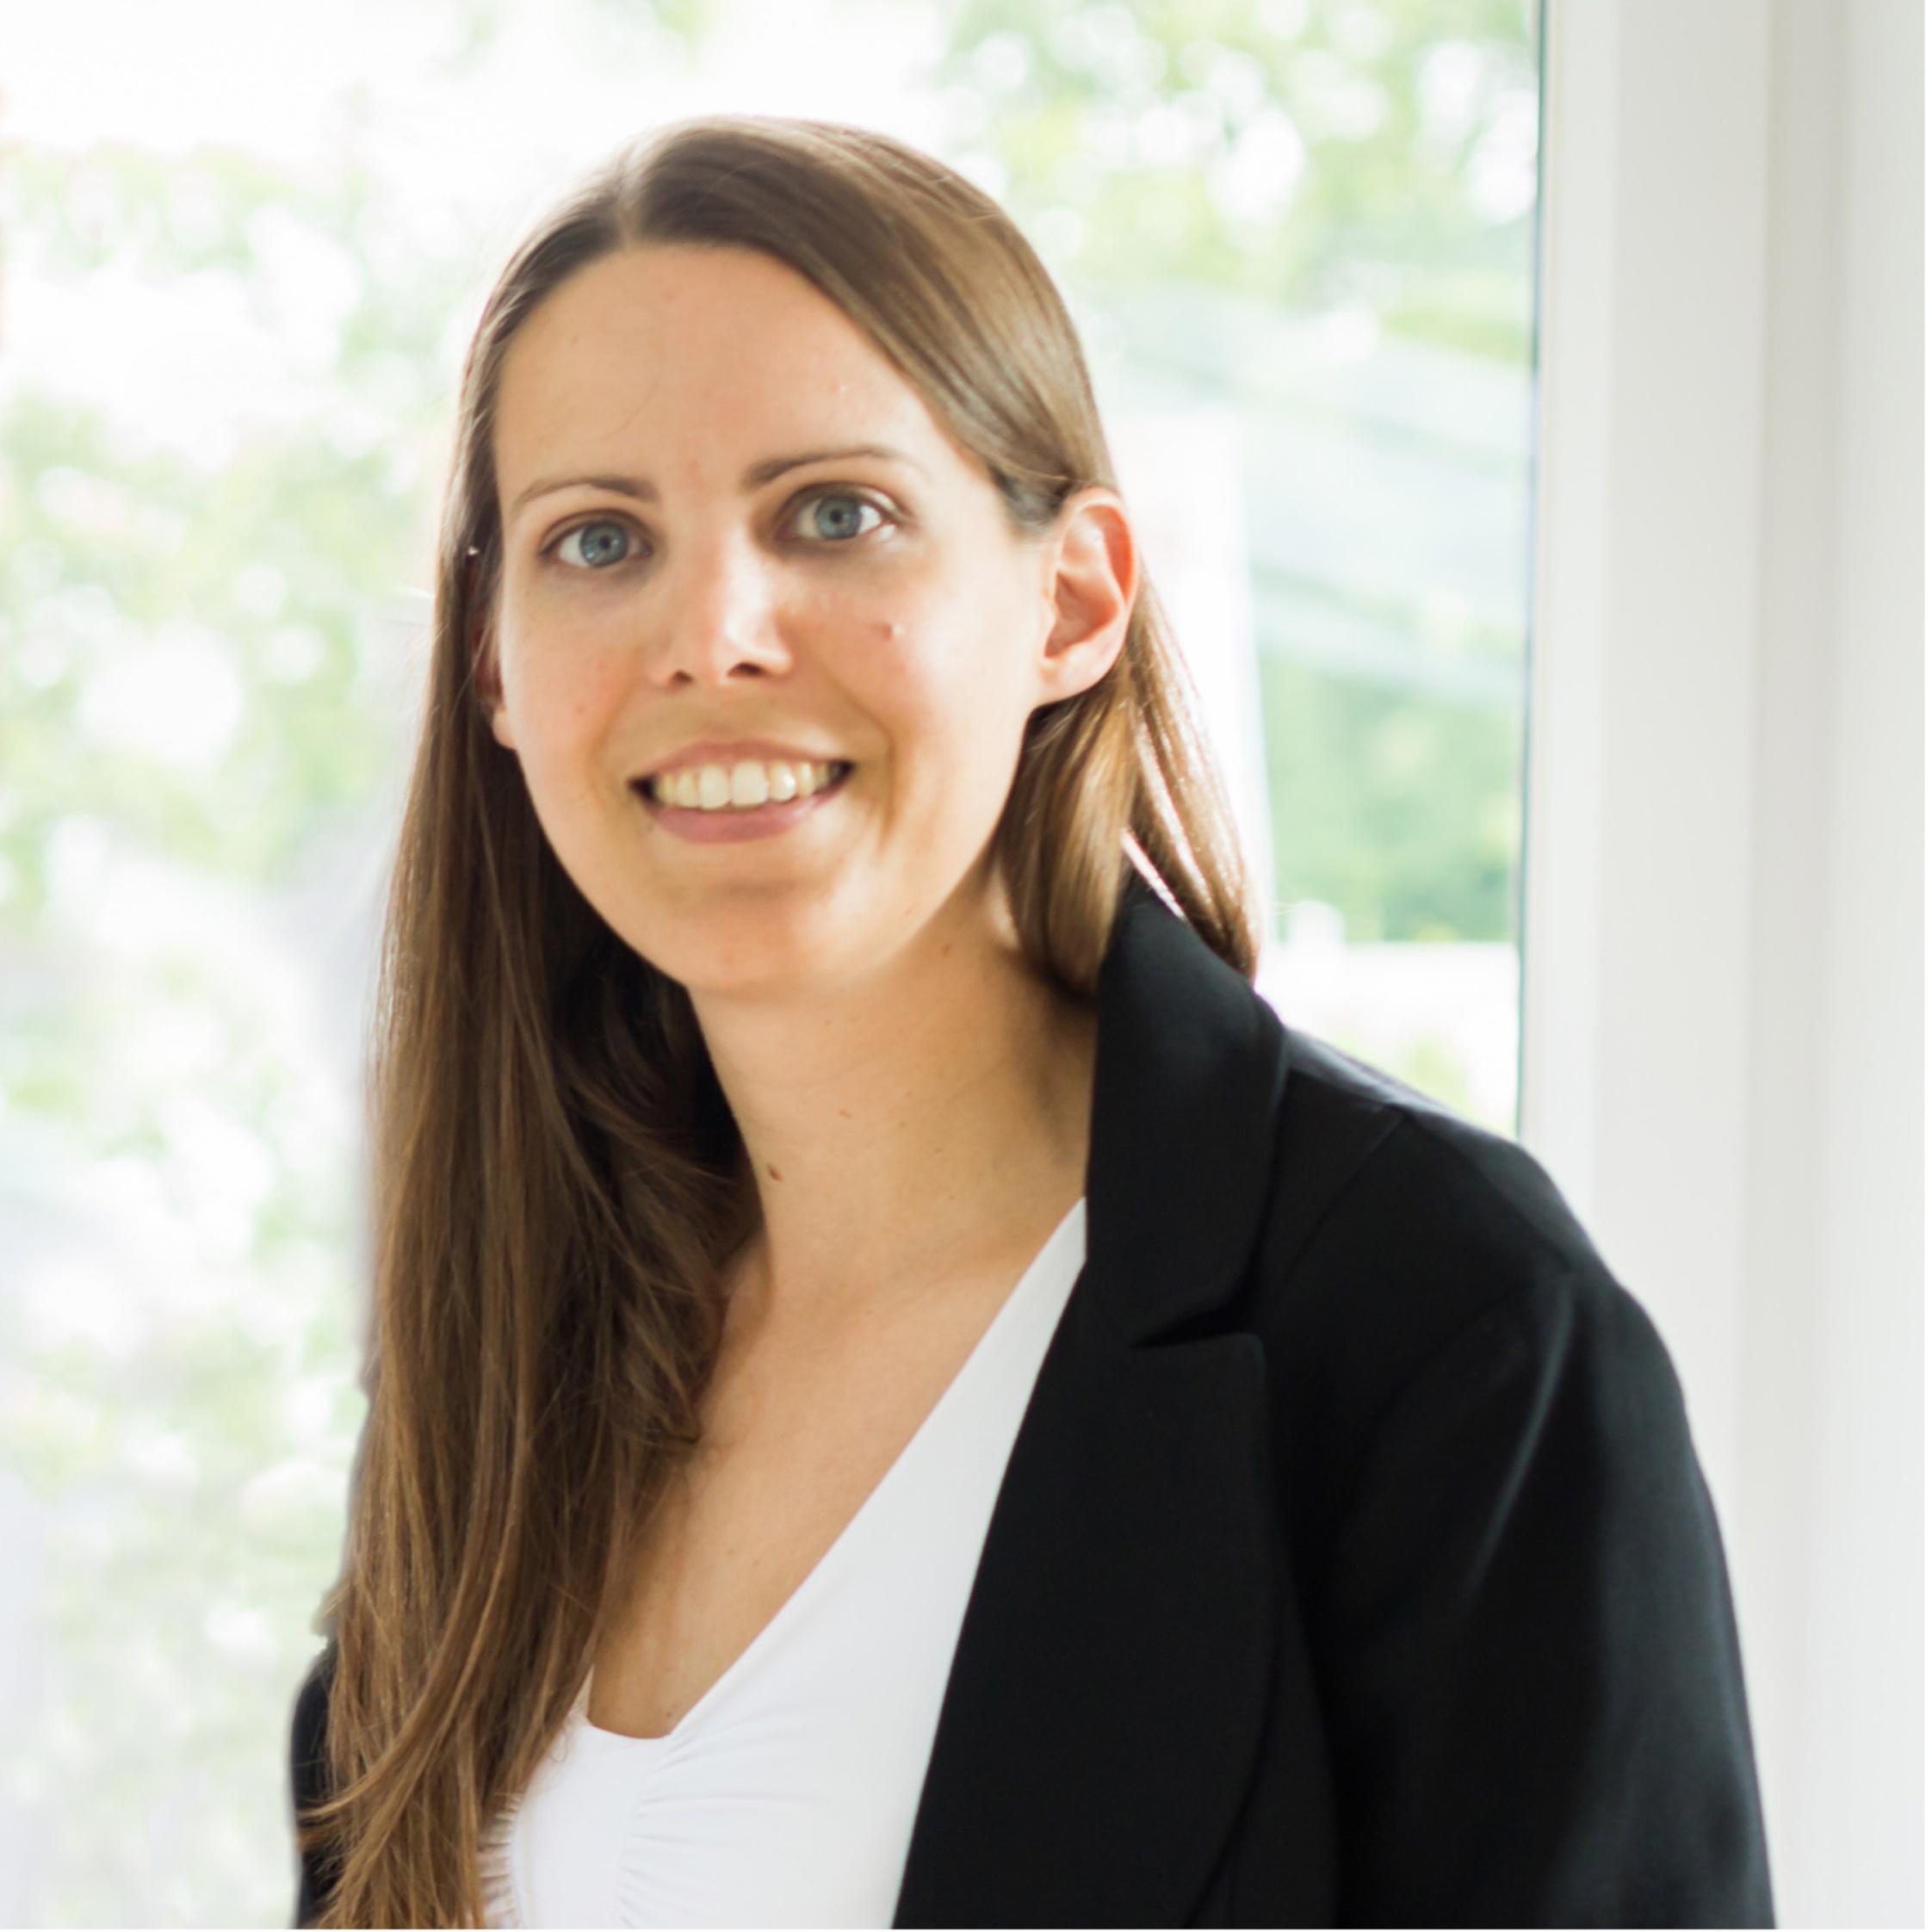 Dr. Nadine Sinclair